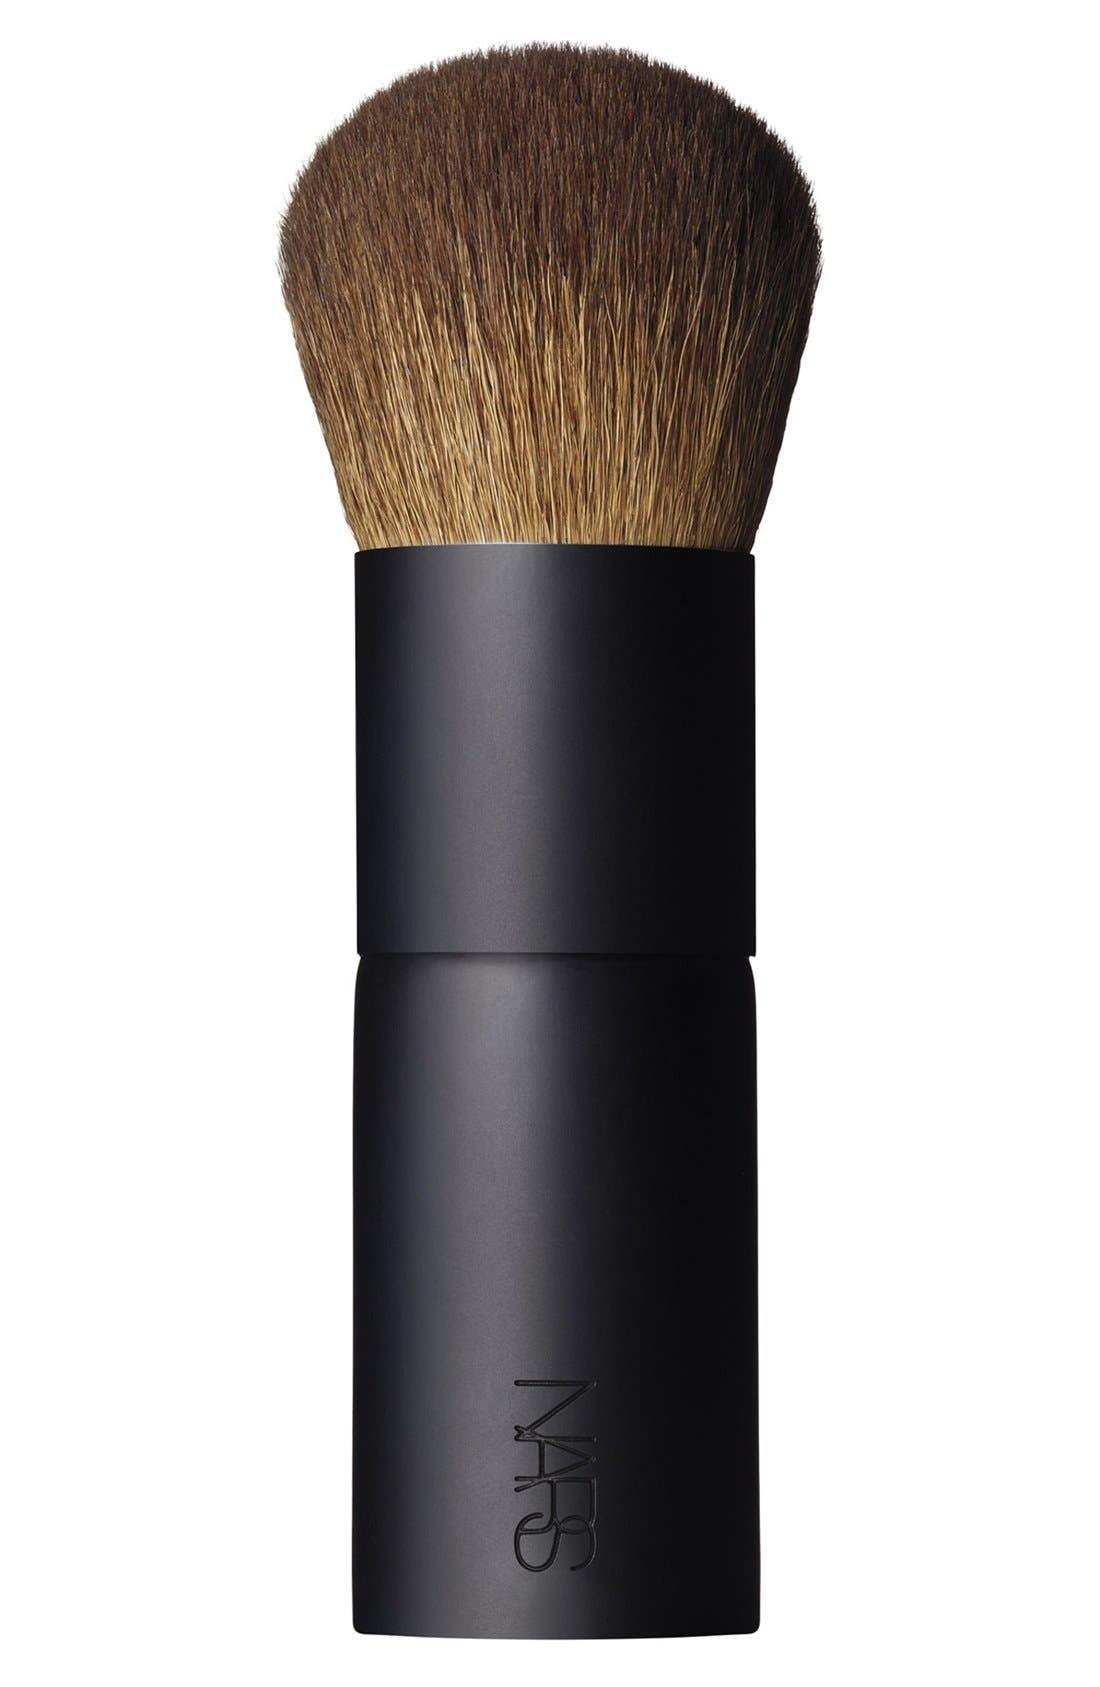 #11 Bronzing Powder Brush by Nars